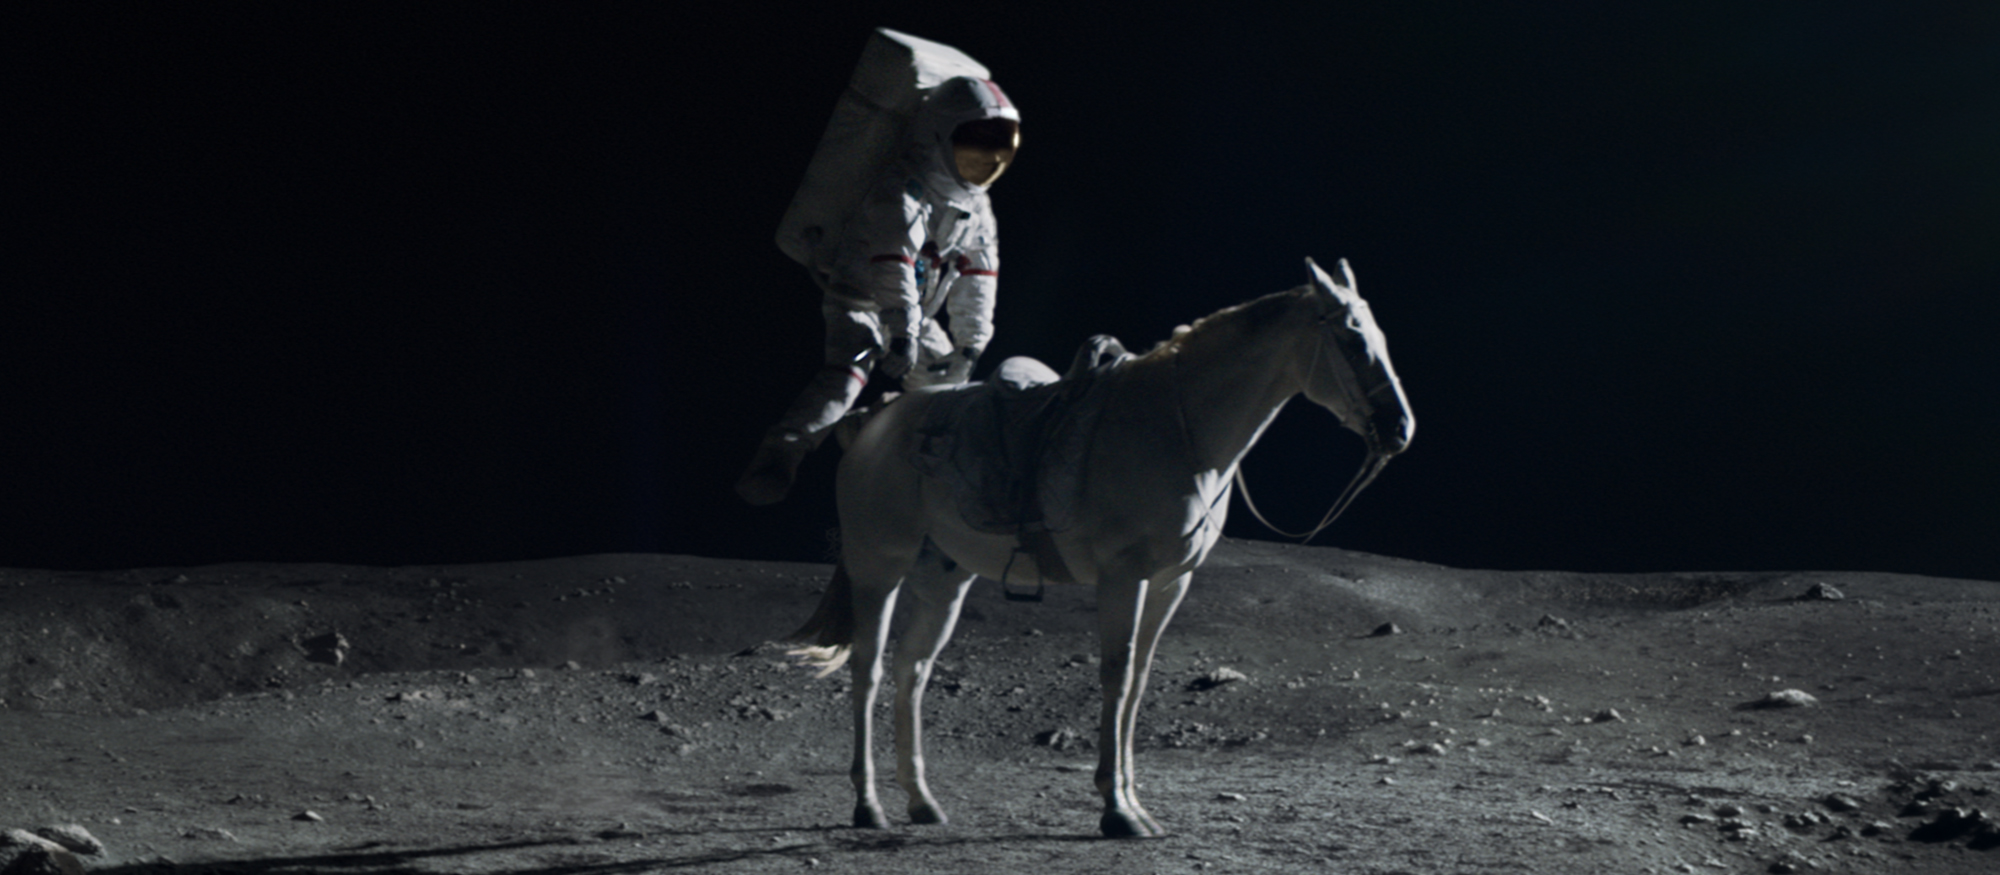 pmu-publicite-course-hippique-cosmonaute-armstrong-cheval-lune-buzzman